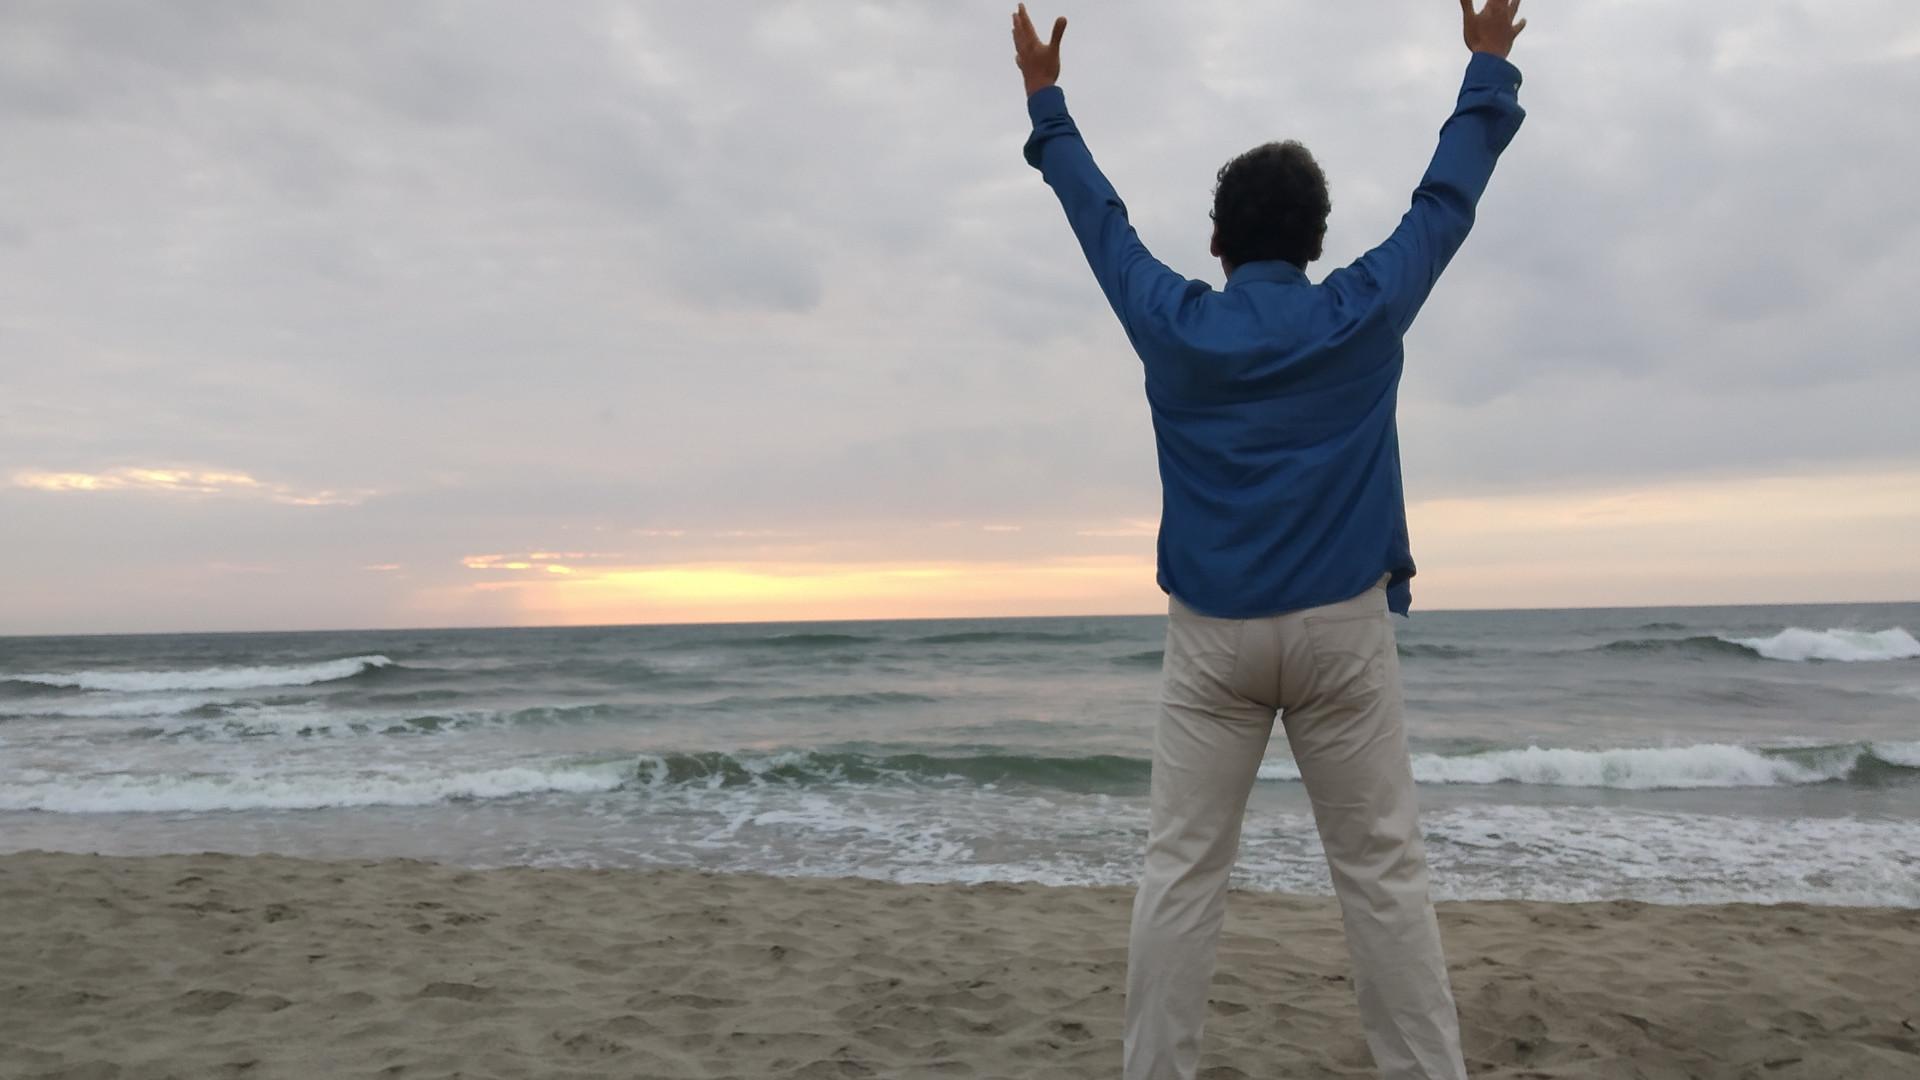 Greeting the Heaven